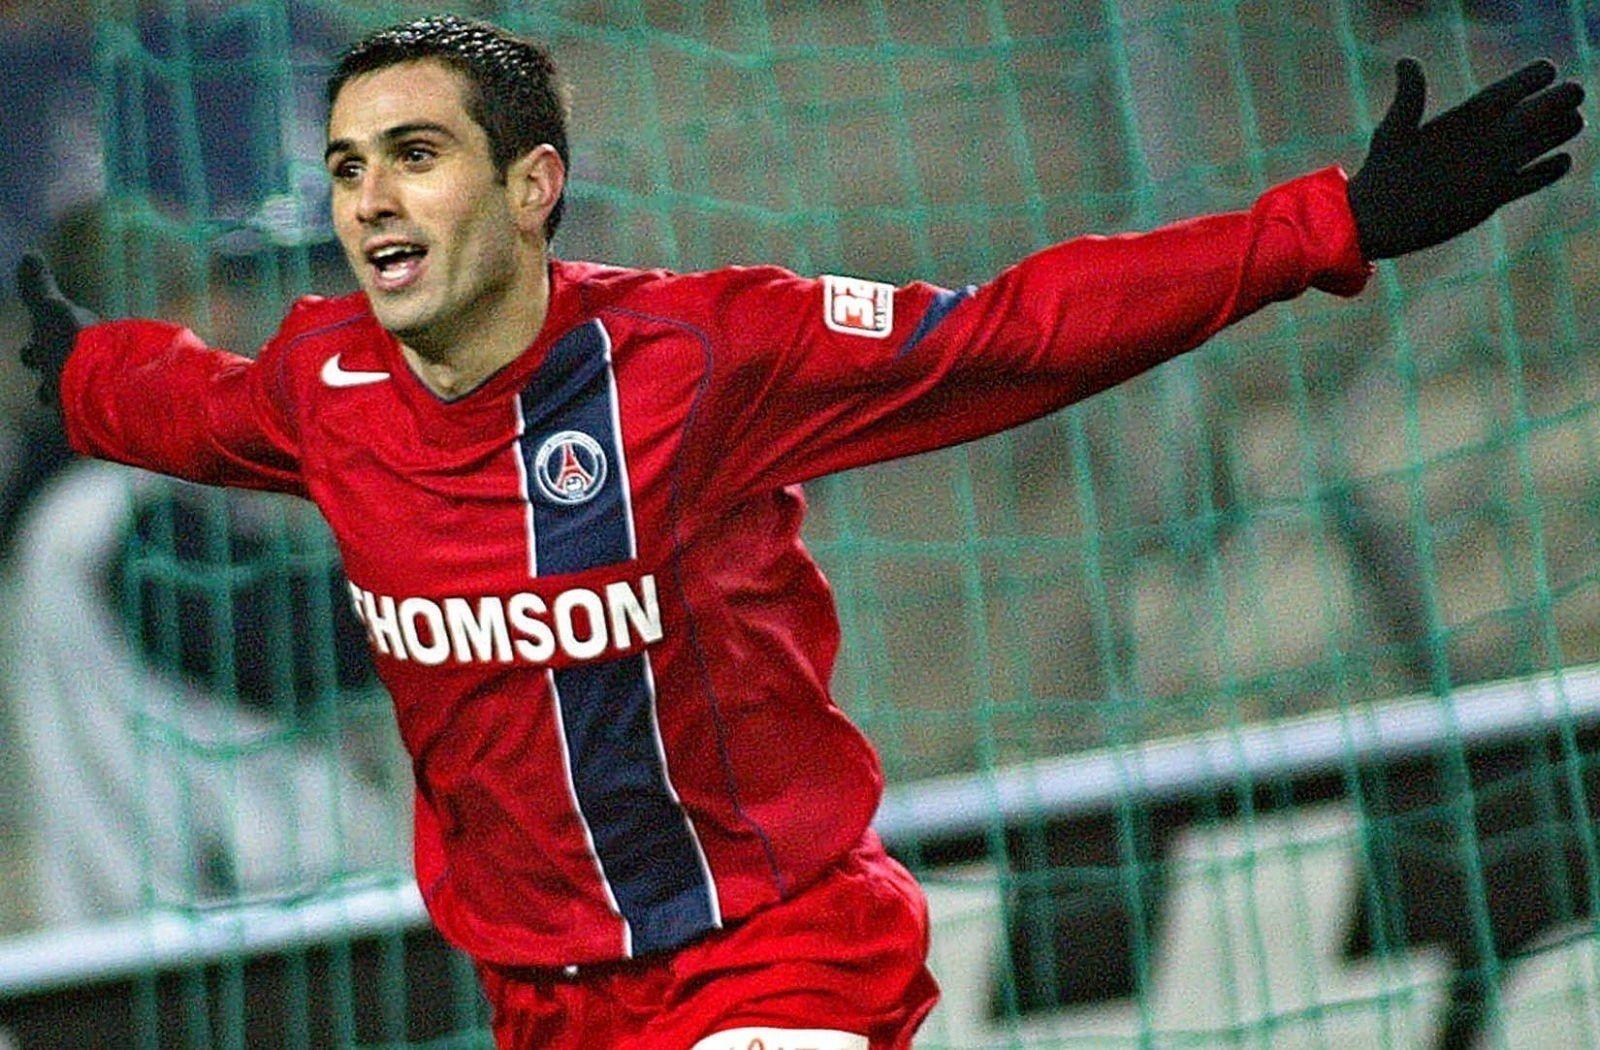 Camisa vermelha do PSG 2004